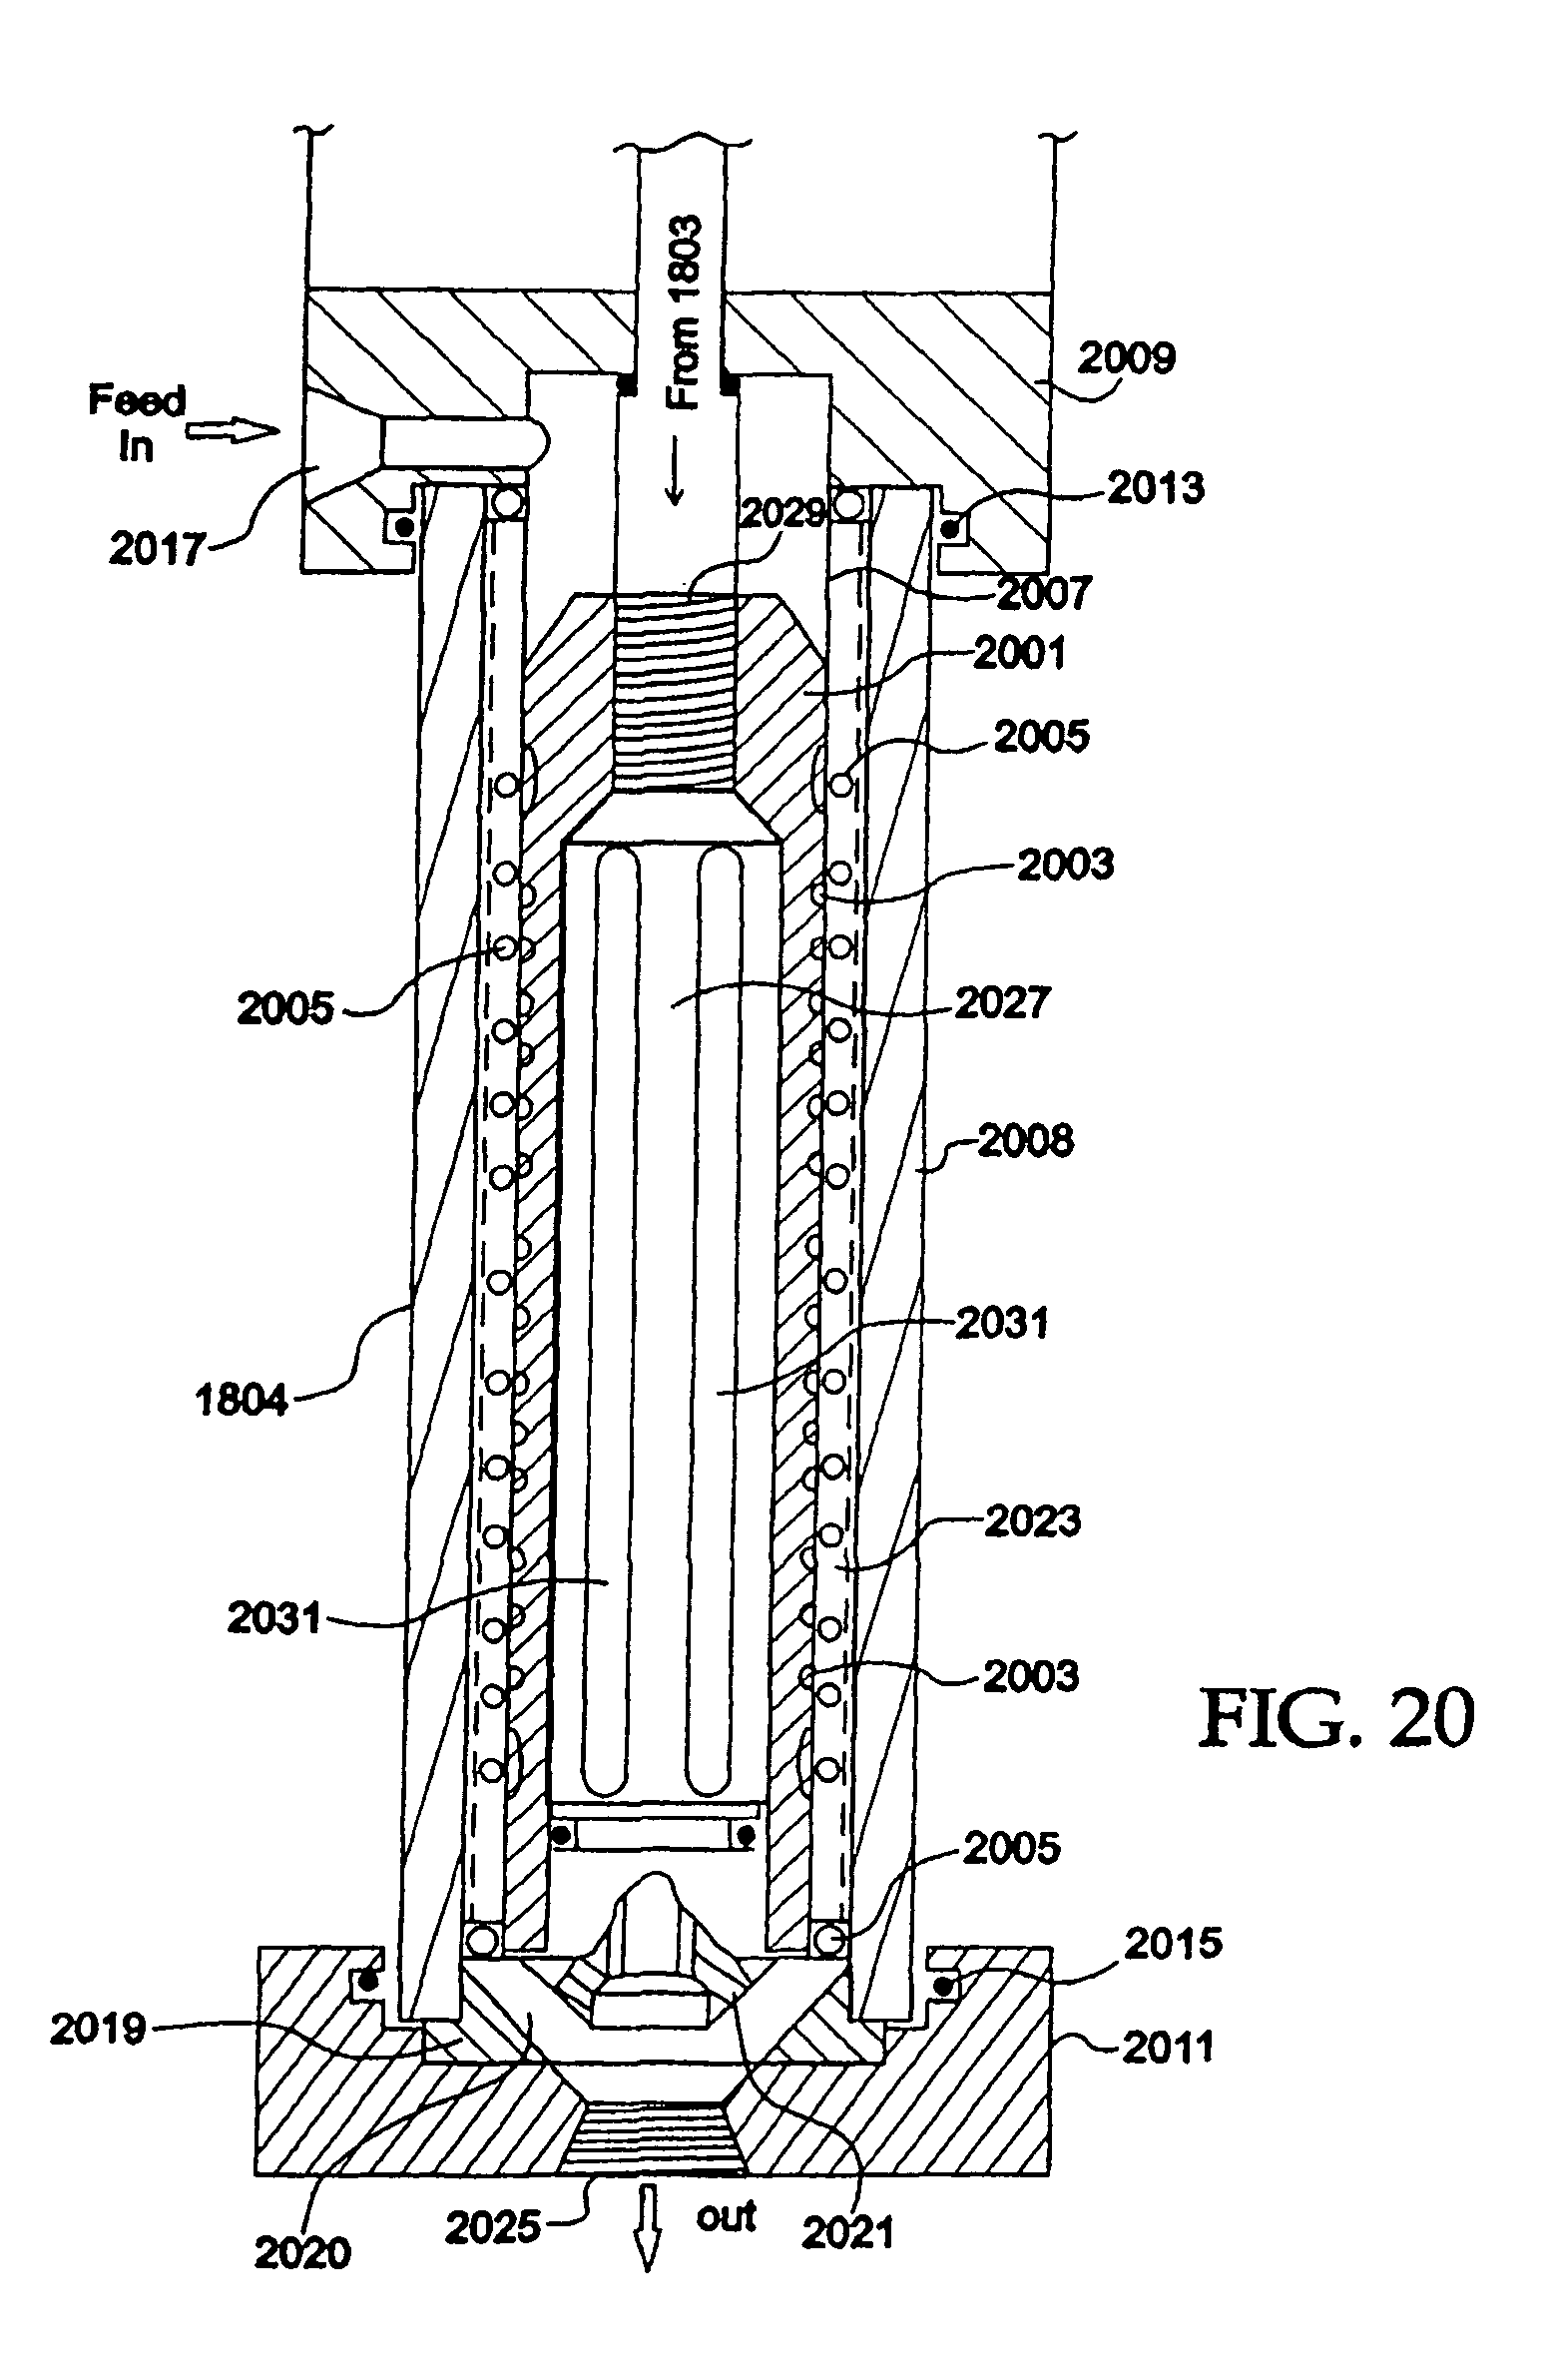 2001 toyota tundra parts diagram throat front view door schematic html autos post